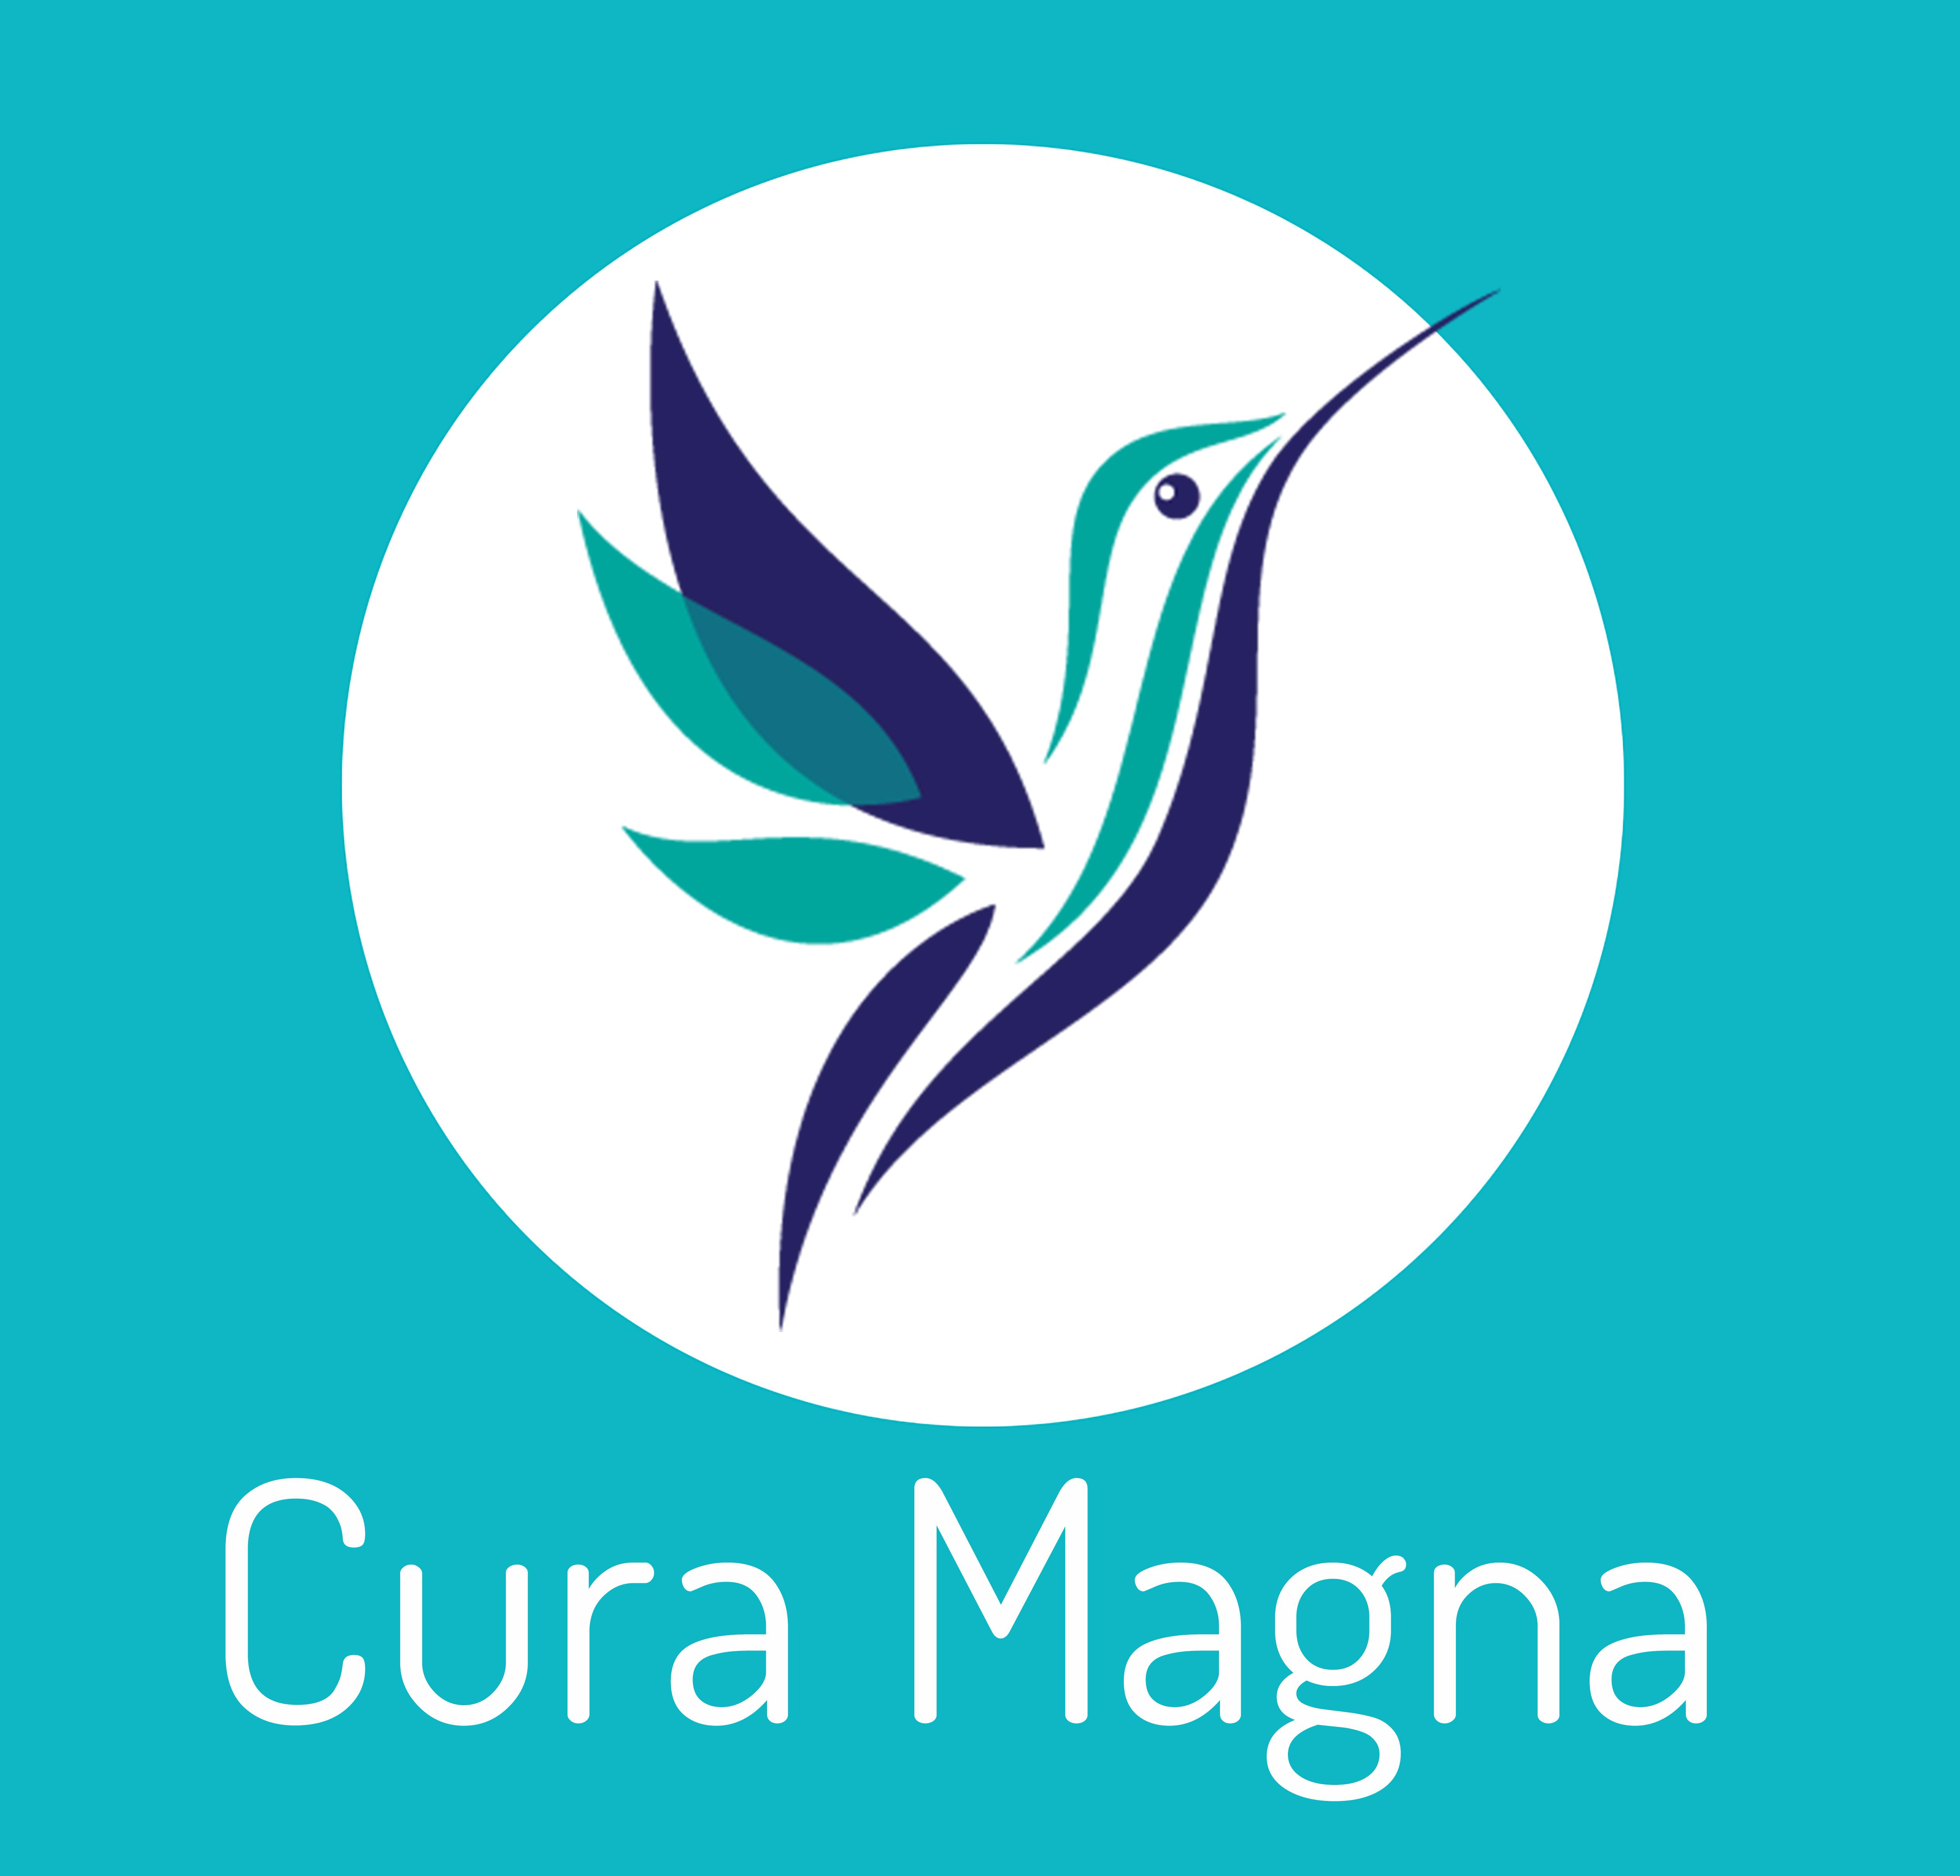 Cura Magna